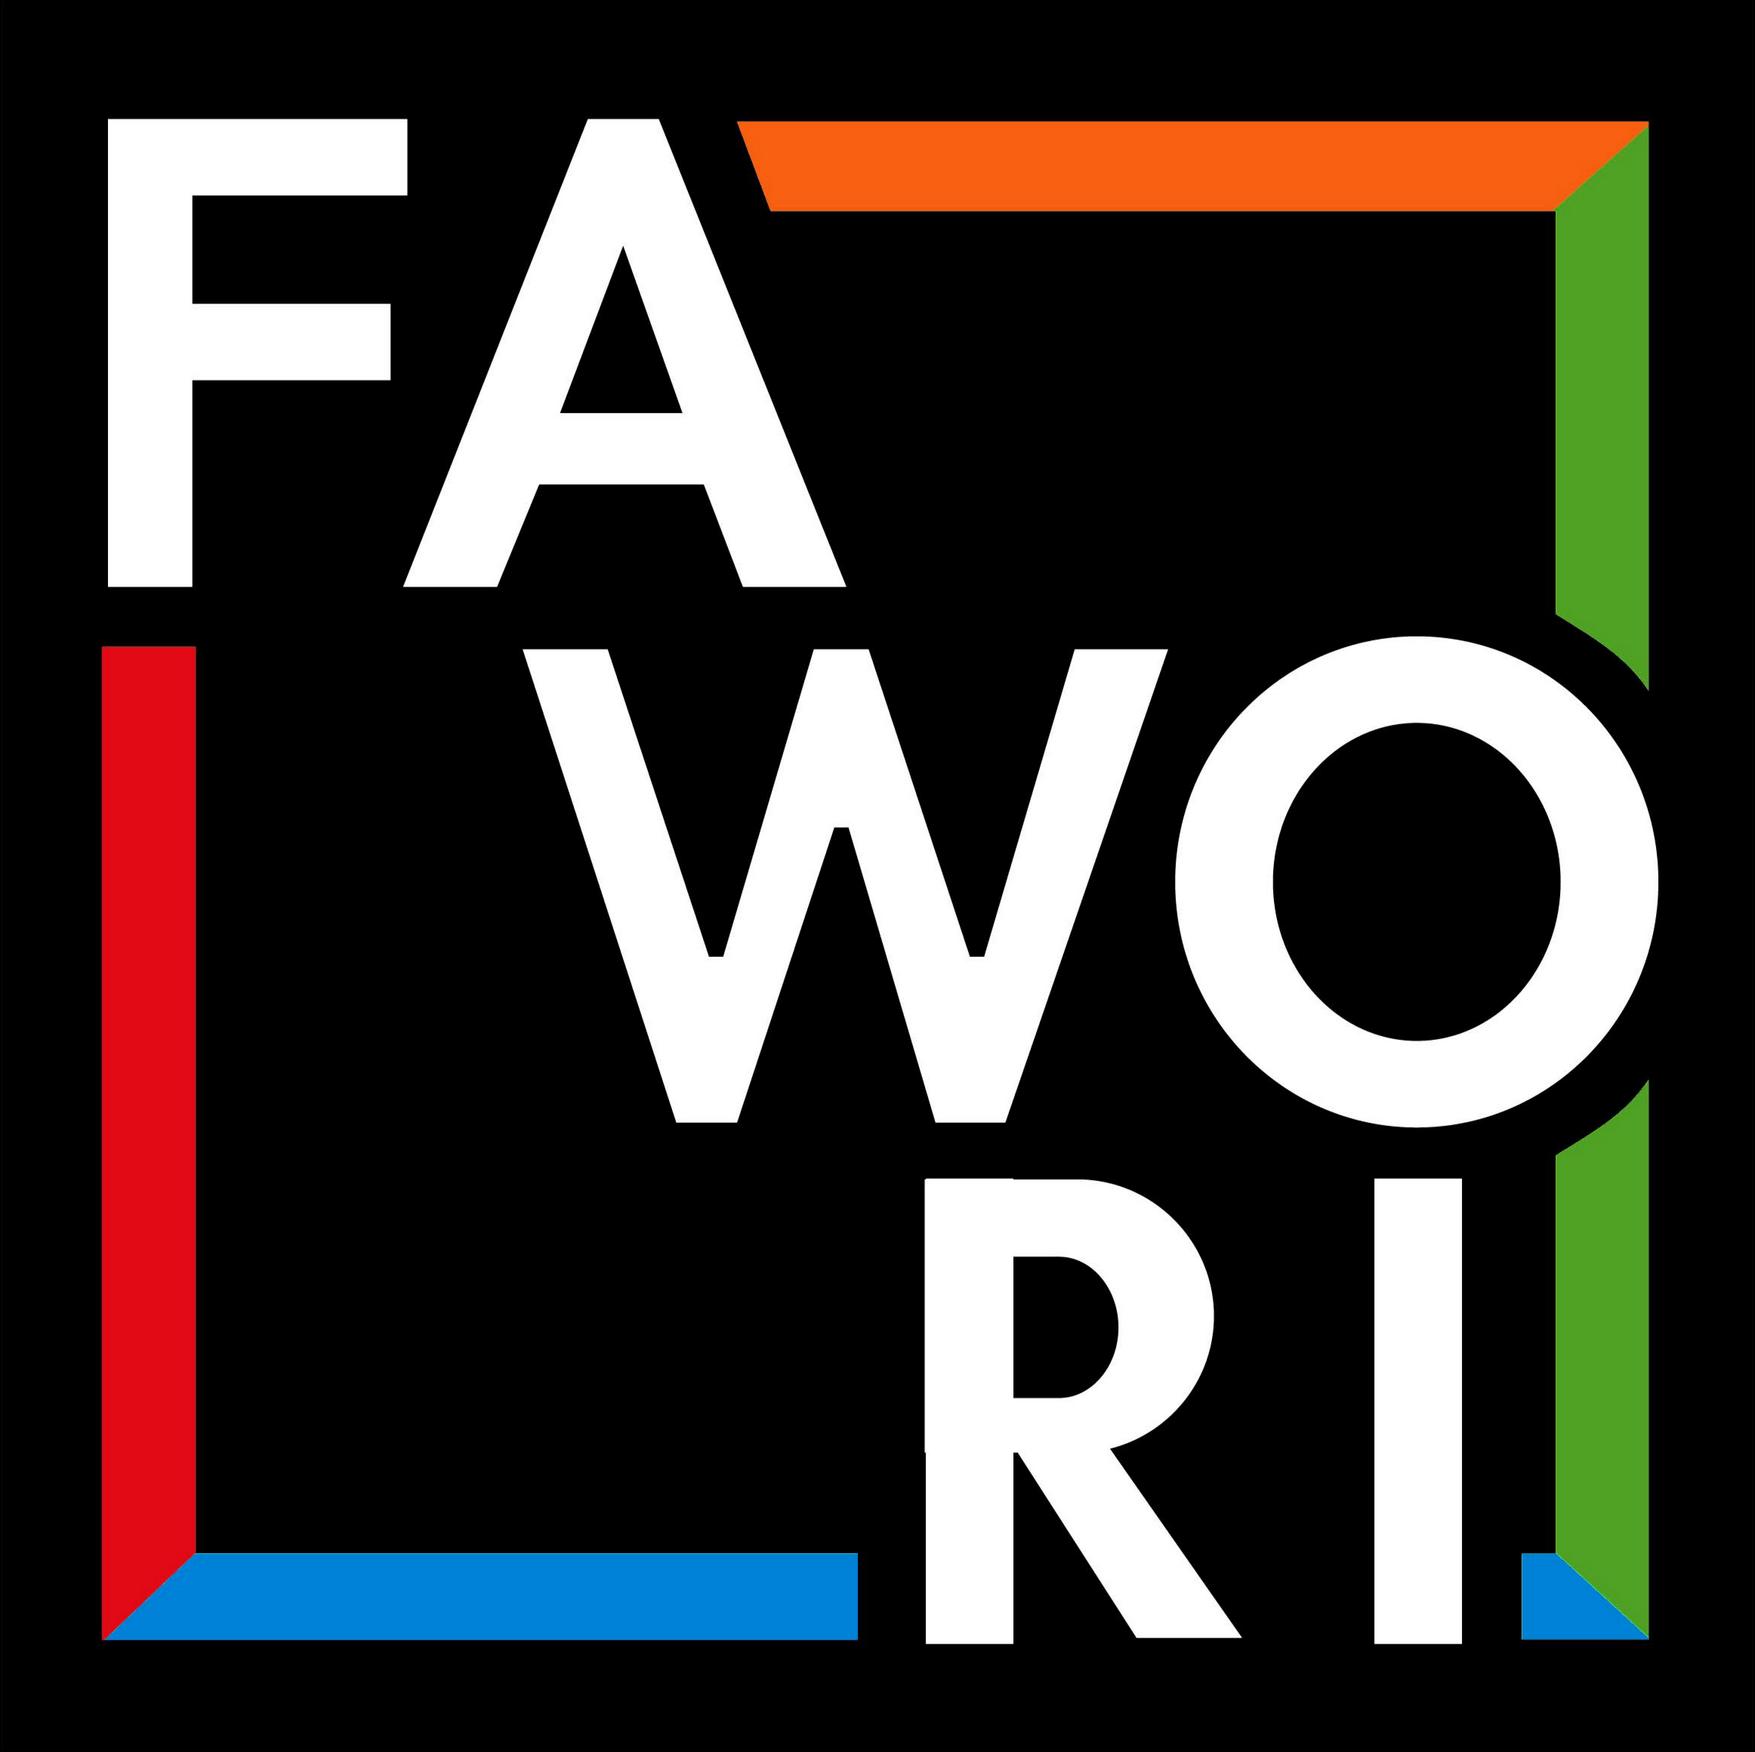 Fawori Boya Logo png